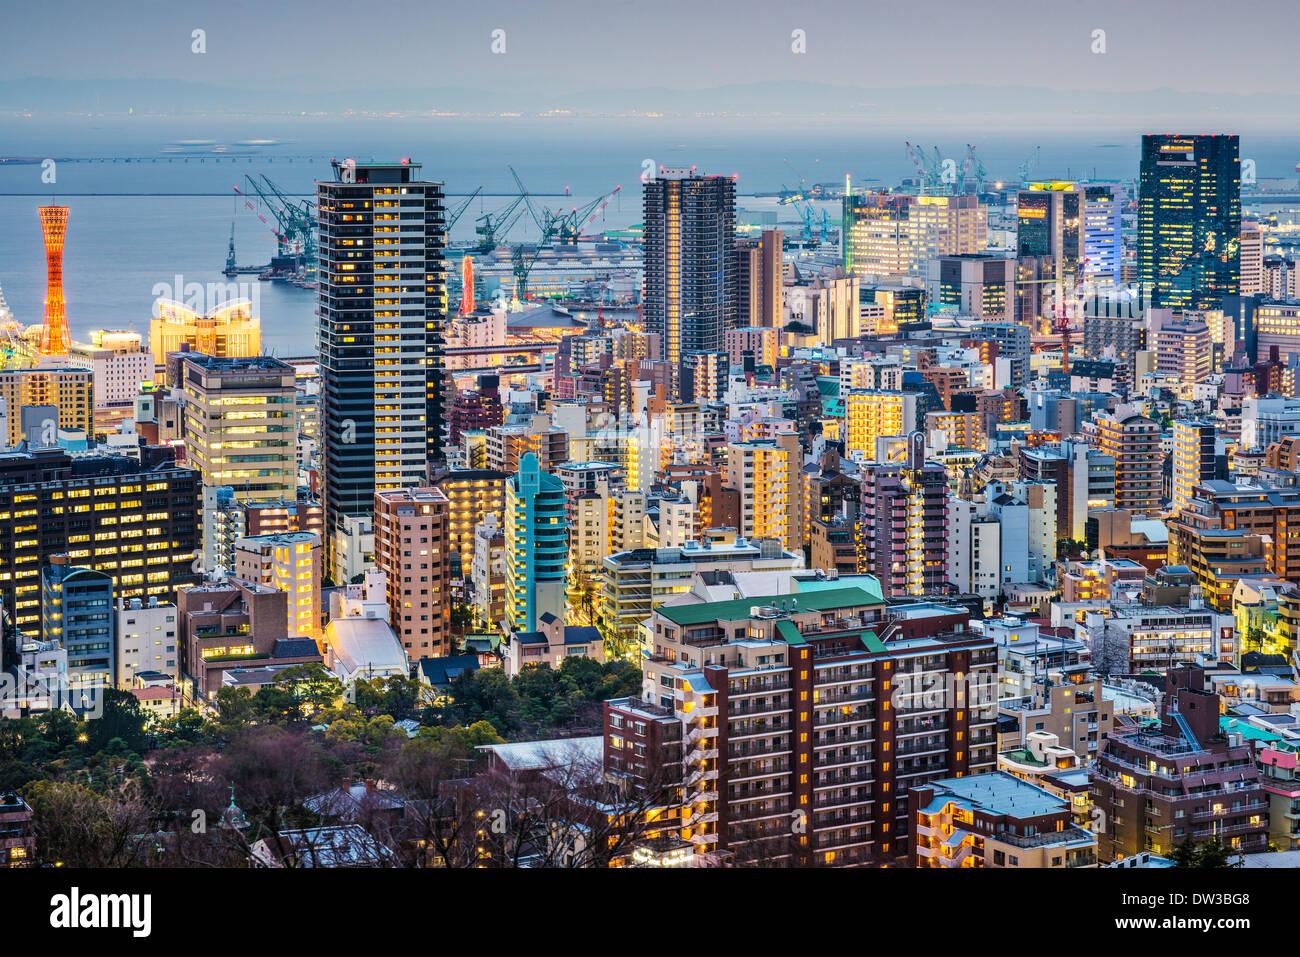 Skyline von Kobe, Japan Stockbild